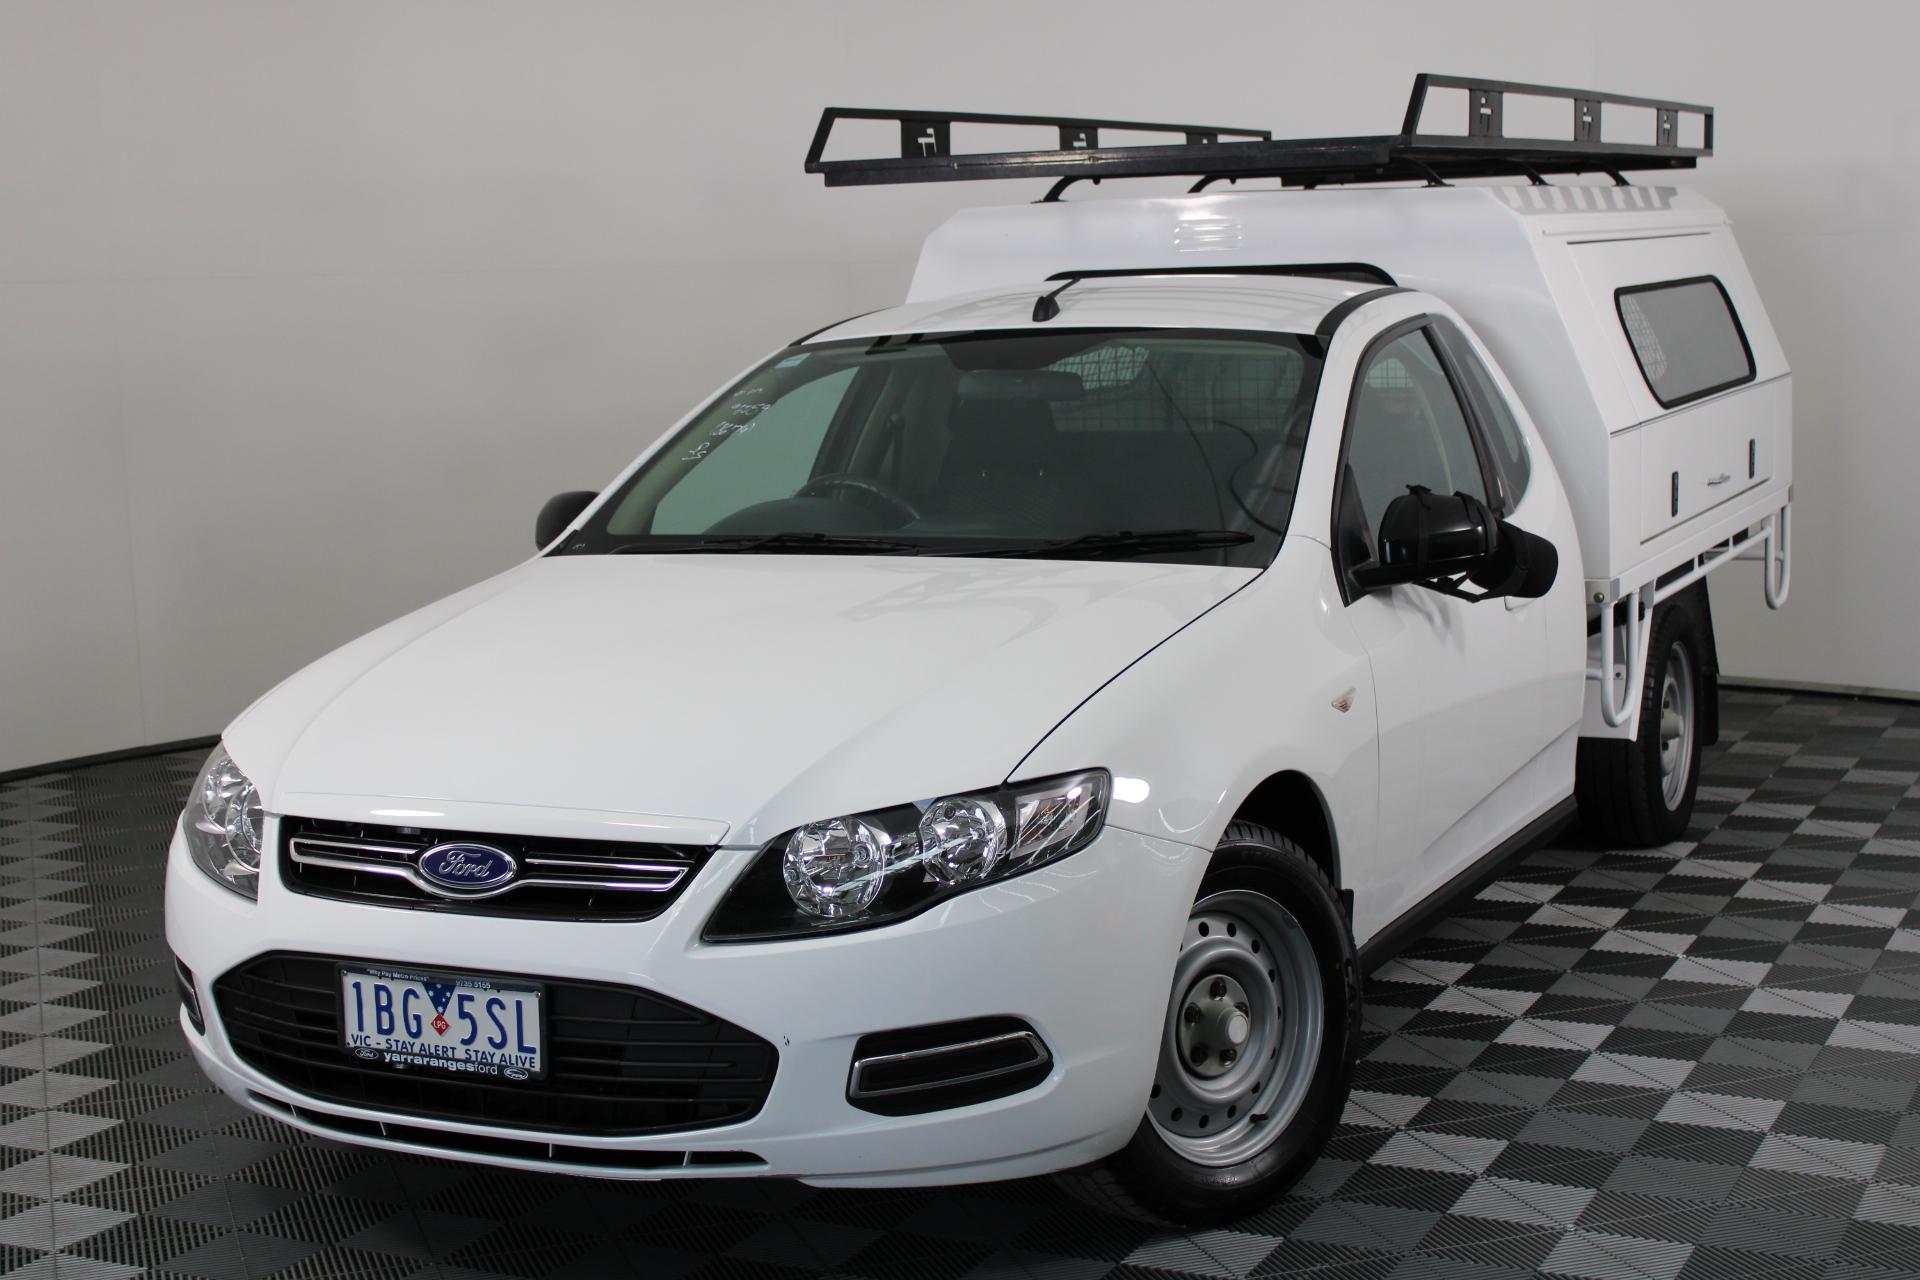 2013 Ford Falcon (LPI) FG II Automatic Cab Chassis (EX GOV)